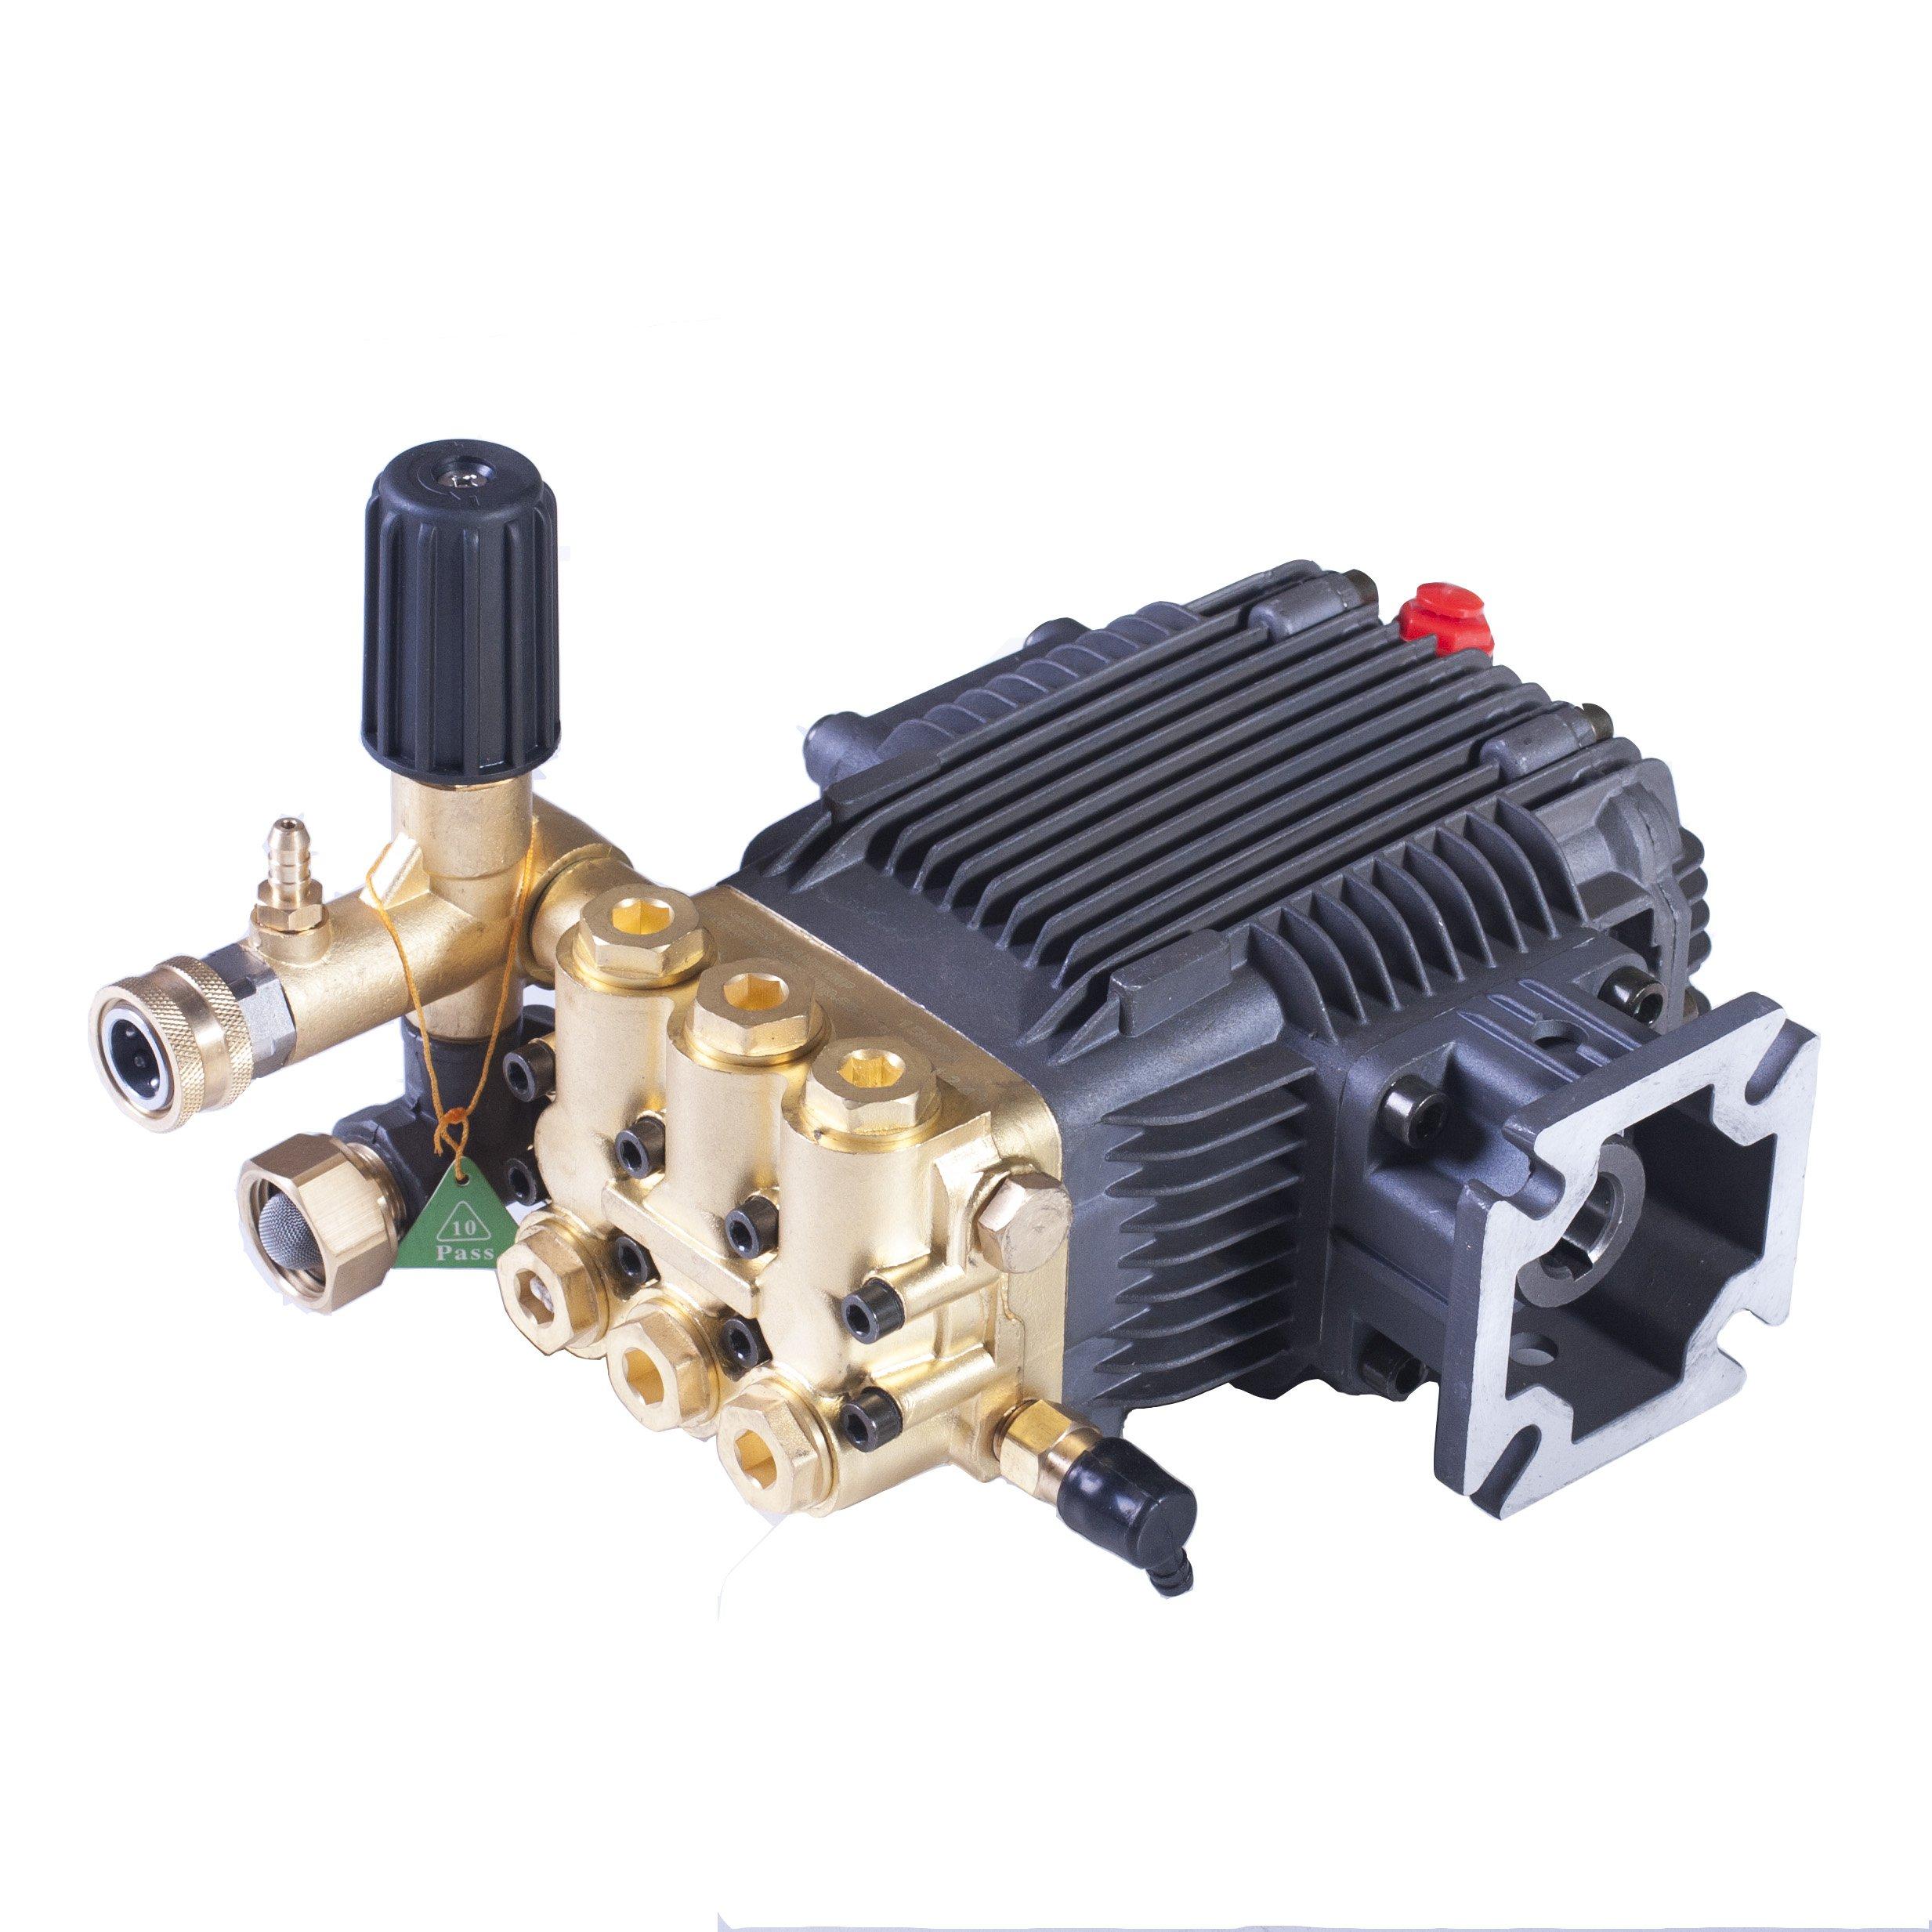 Triplex High Pressure Power Washer Pump 3.1 GPM 3000 psi 6.5 HP 3/4'' Shaft fits Cat General AR